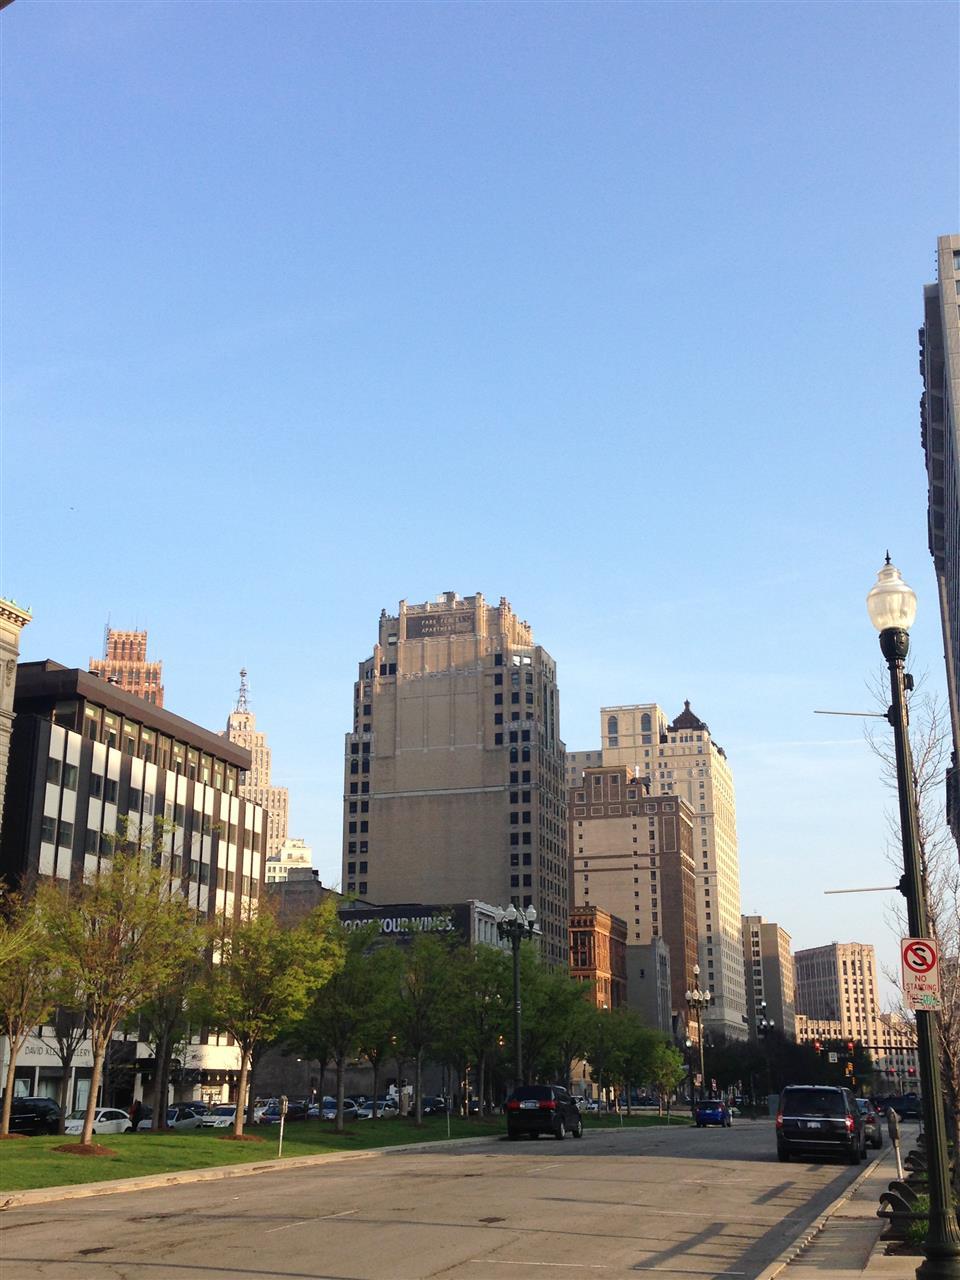 City view of Detroit ~ Detroit, Michigan #LeadingRElocal #Detroit #Michigan